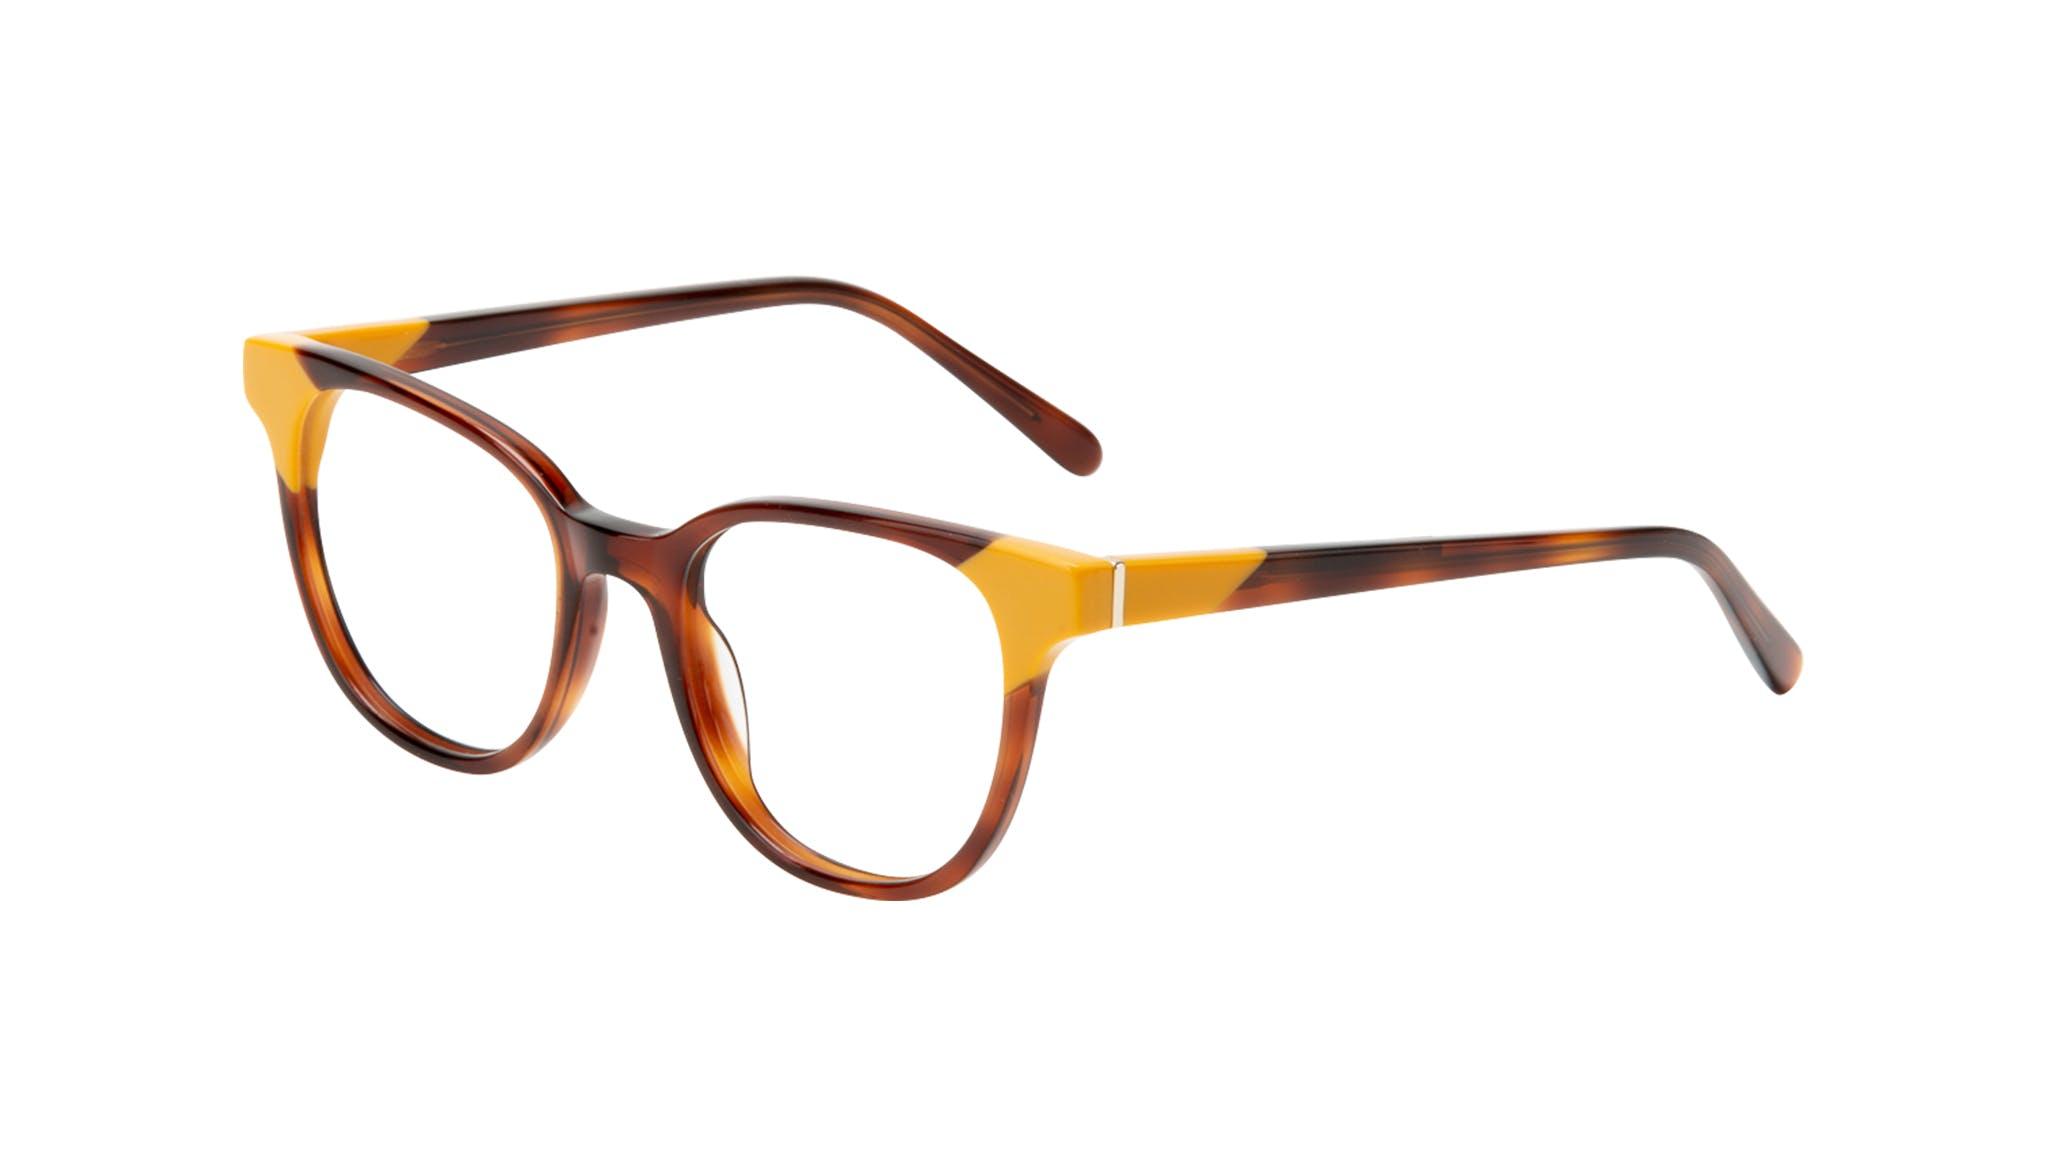 Affordable Fashion Glasses Square Eyeglasses Women Lively Yellow Pop Tilt